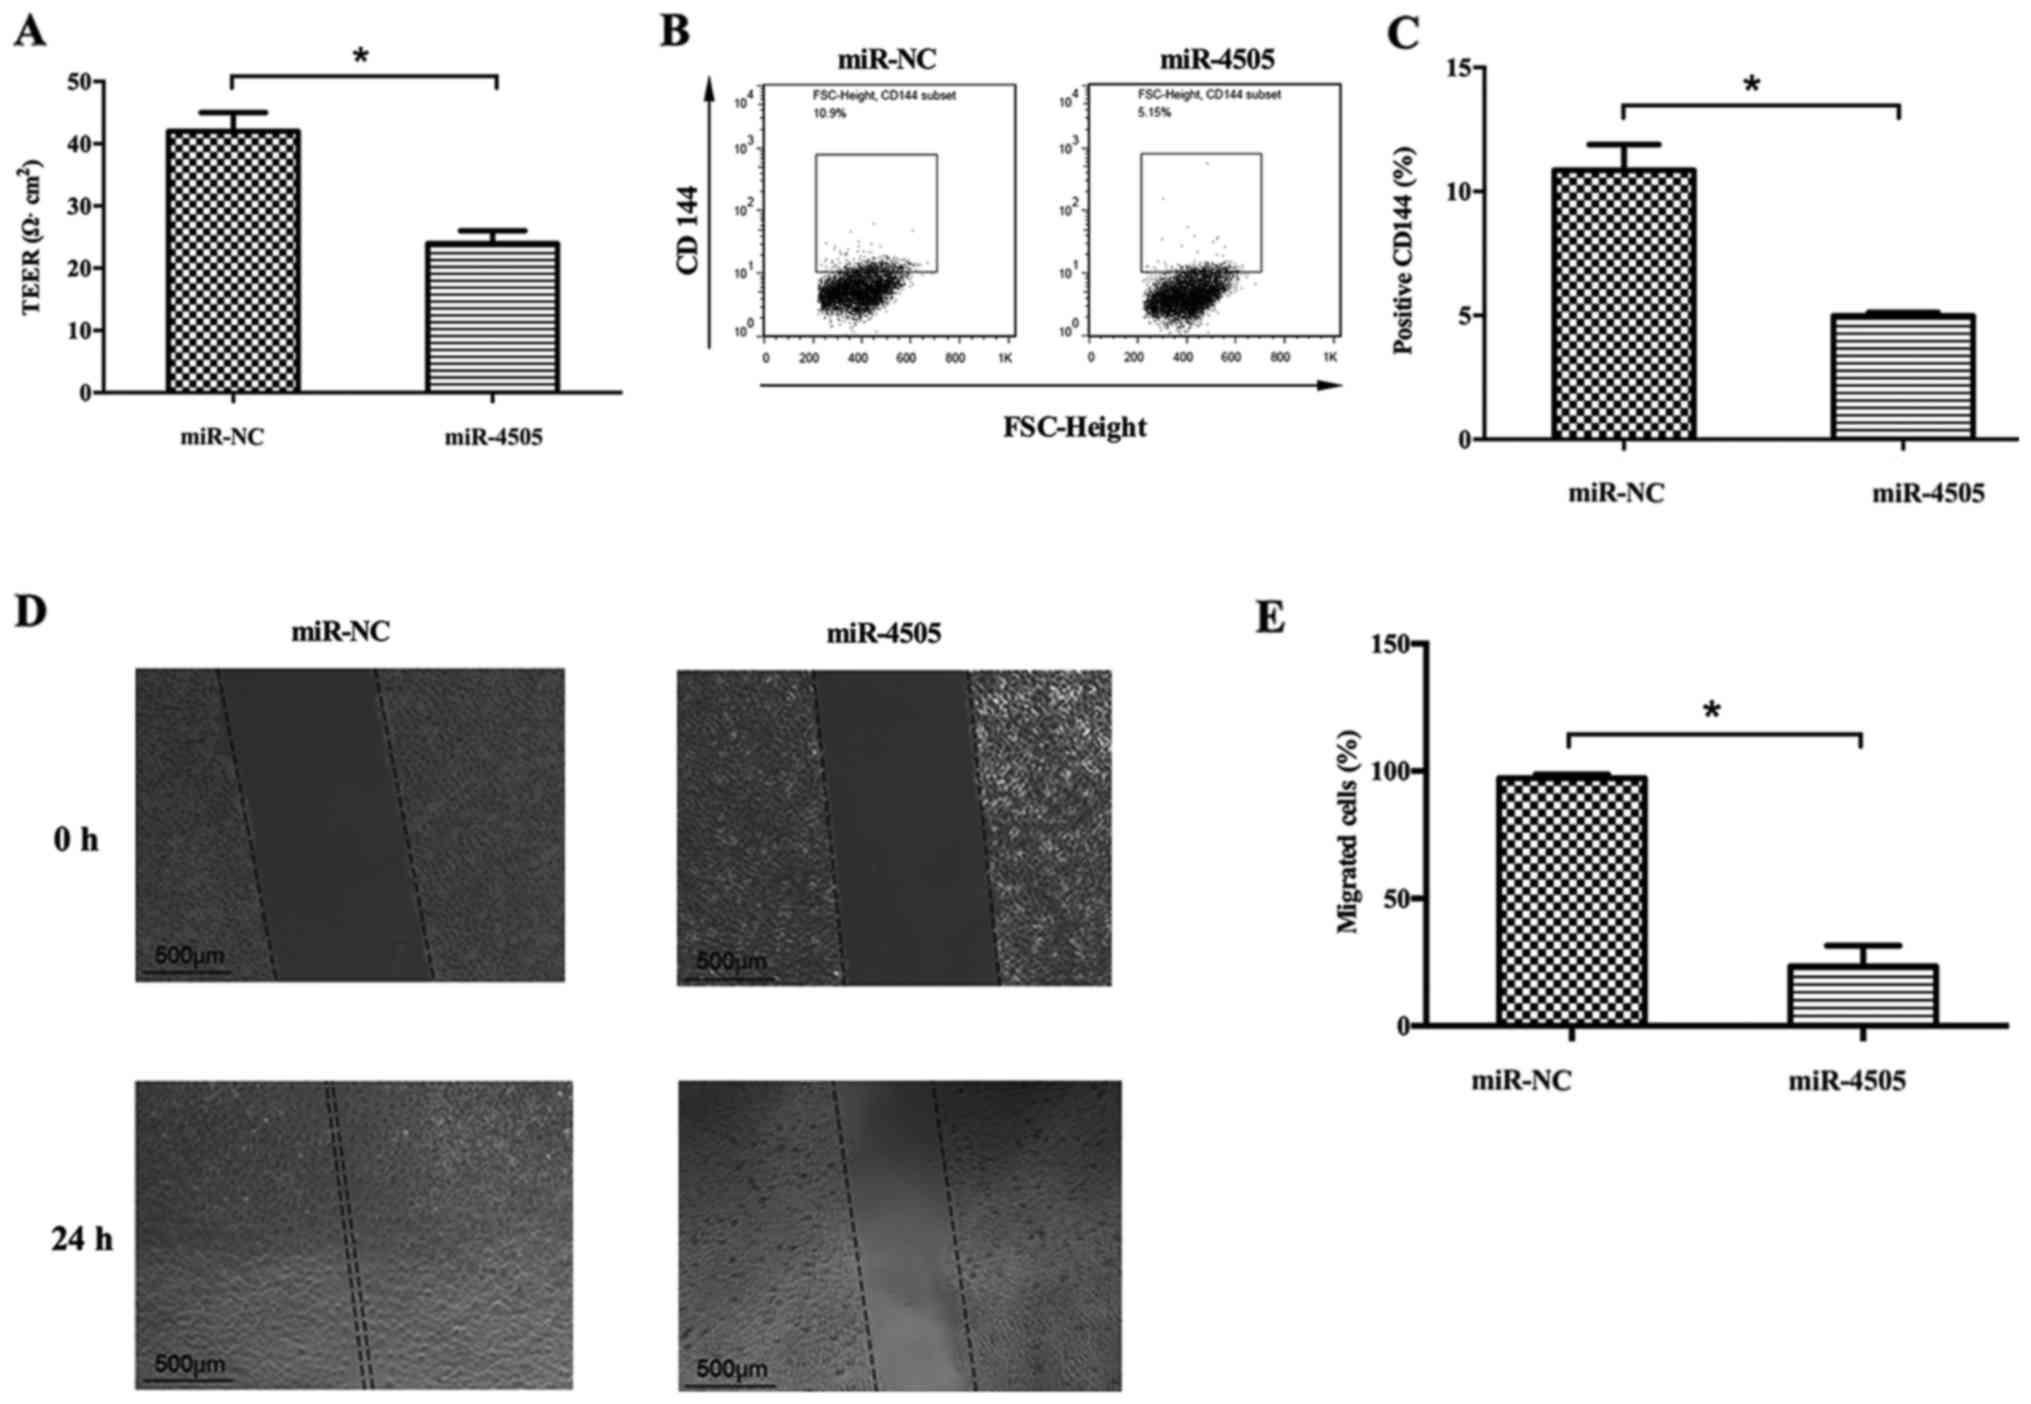 MiR-4505 aggravates lipopolysaccharide-induced vascular